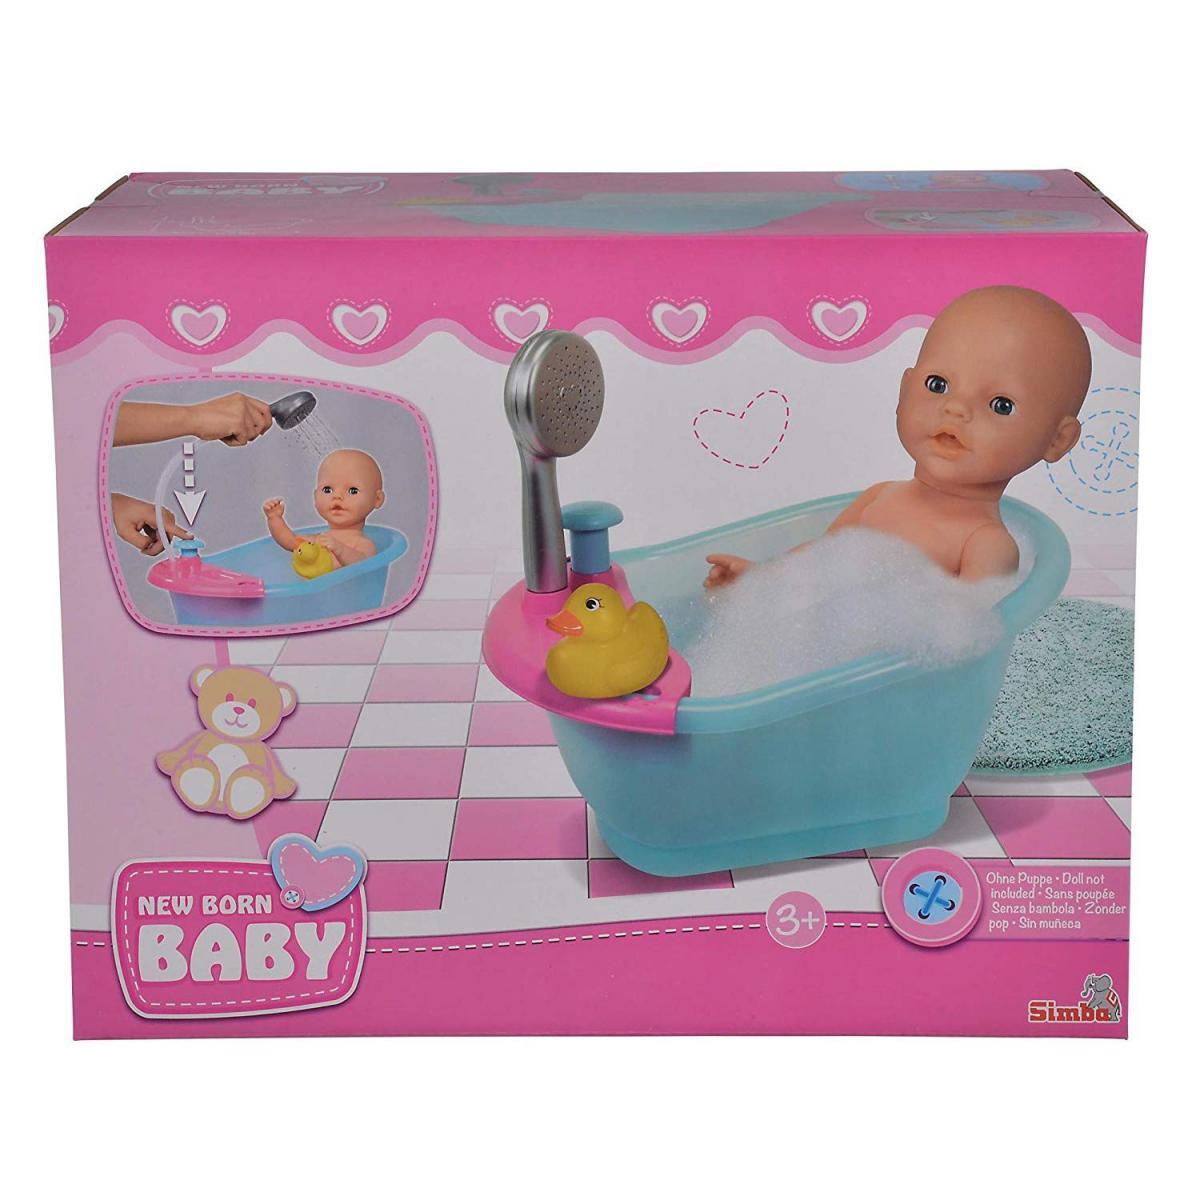 Simba Toys Simba Toys 105560123 - New Born Baignoire Bébé Poupée Baignoire